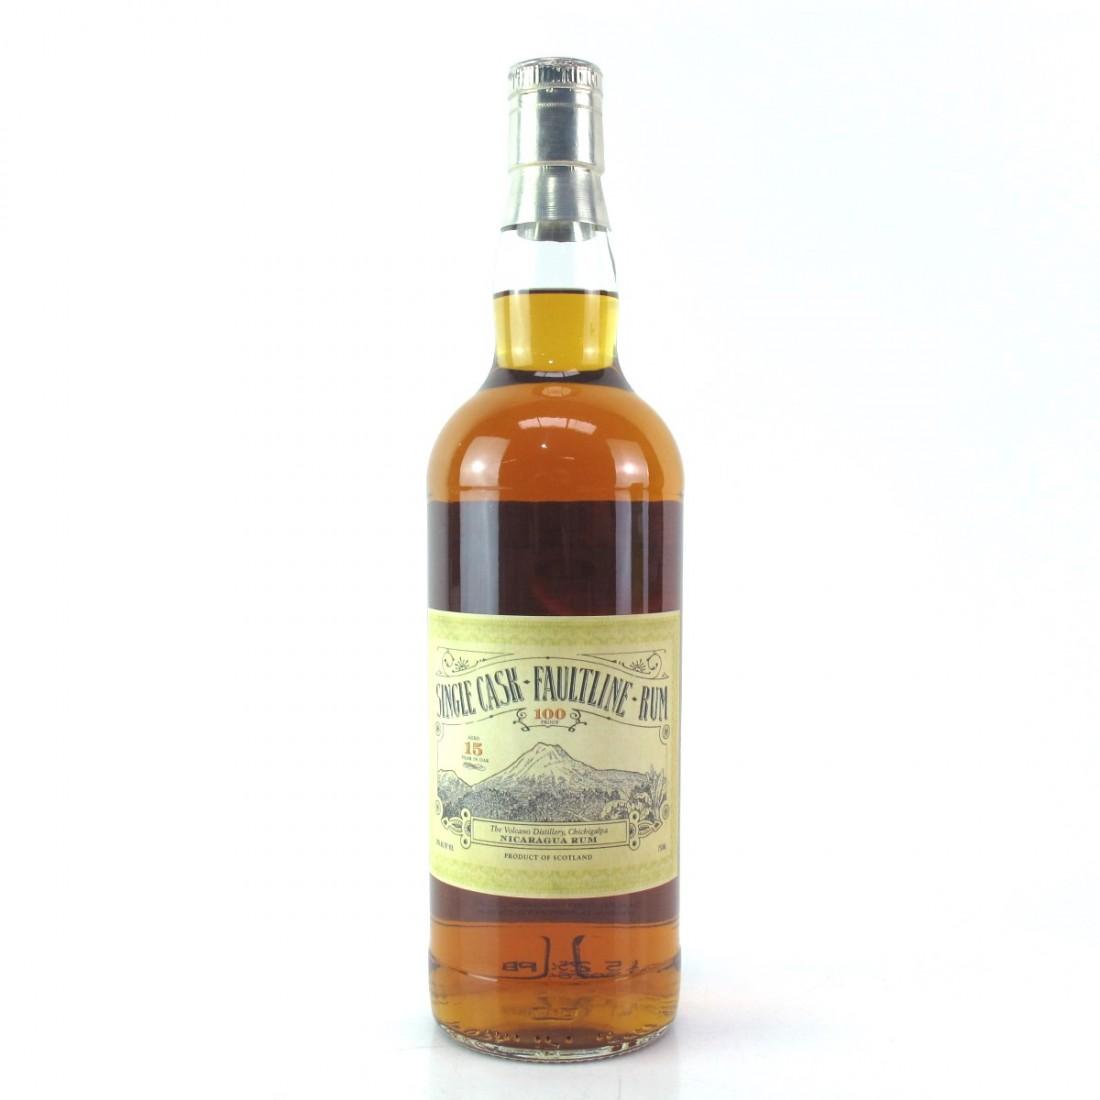 Volcano 15 Year Old Faultline Single Cask Rum 75cl / K&L Wines